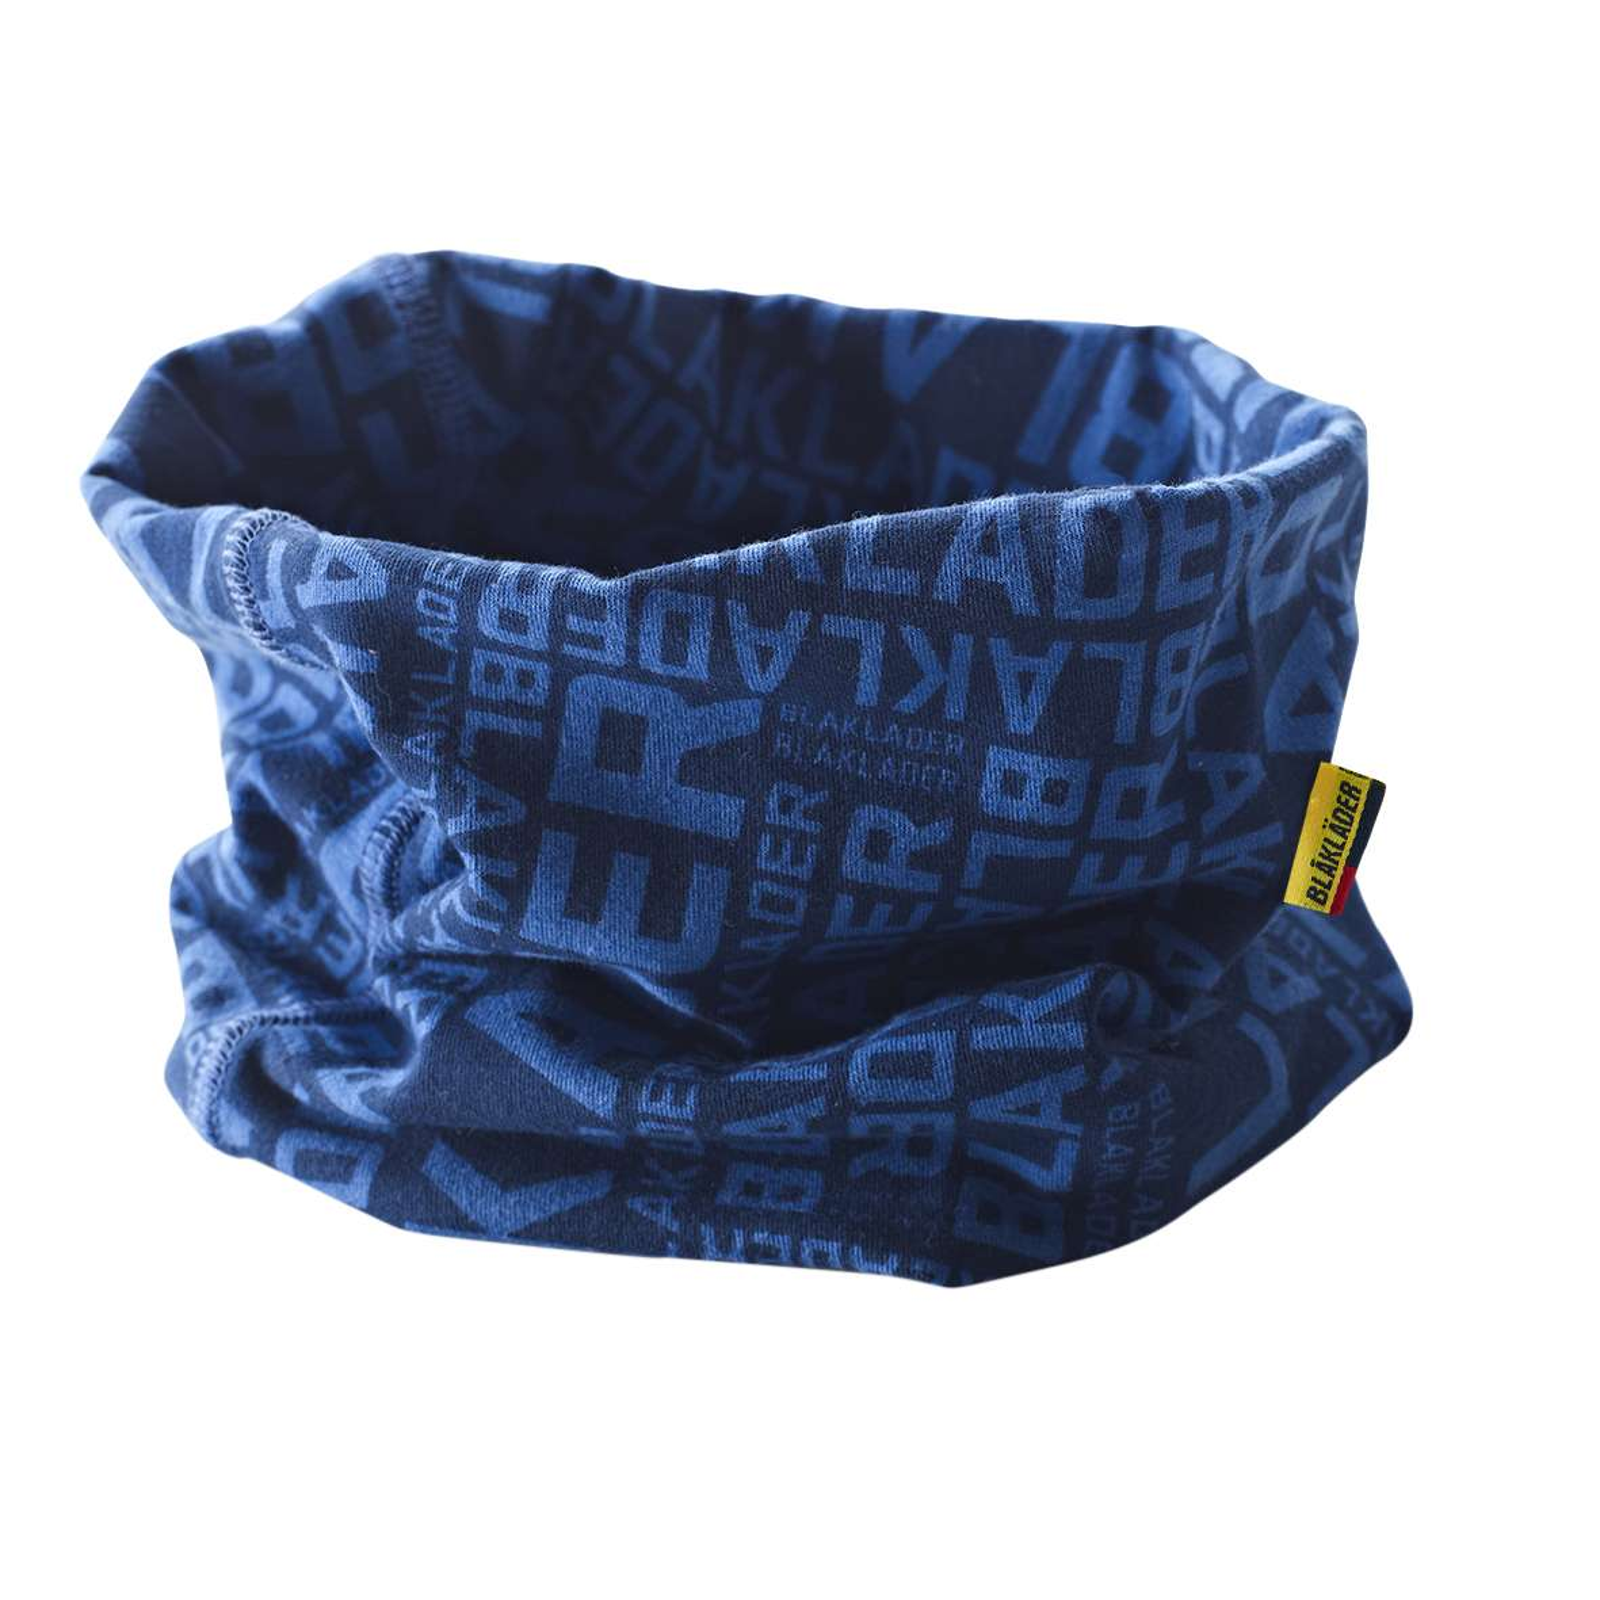 Blaklader Bandana 90831049 marineblauw-steel blue(8983)